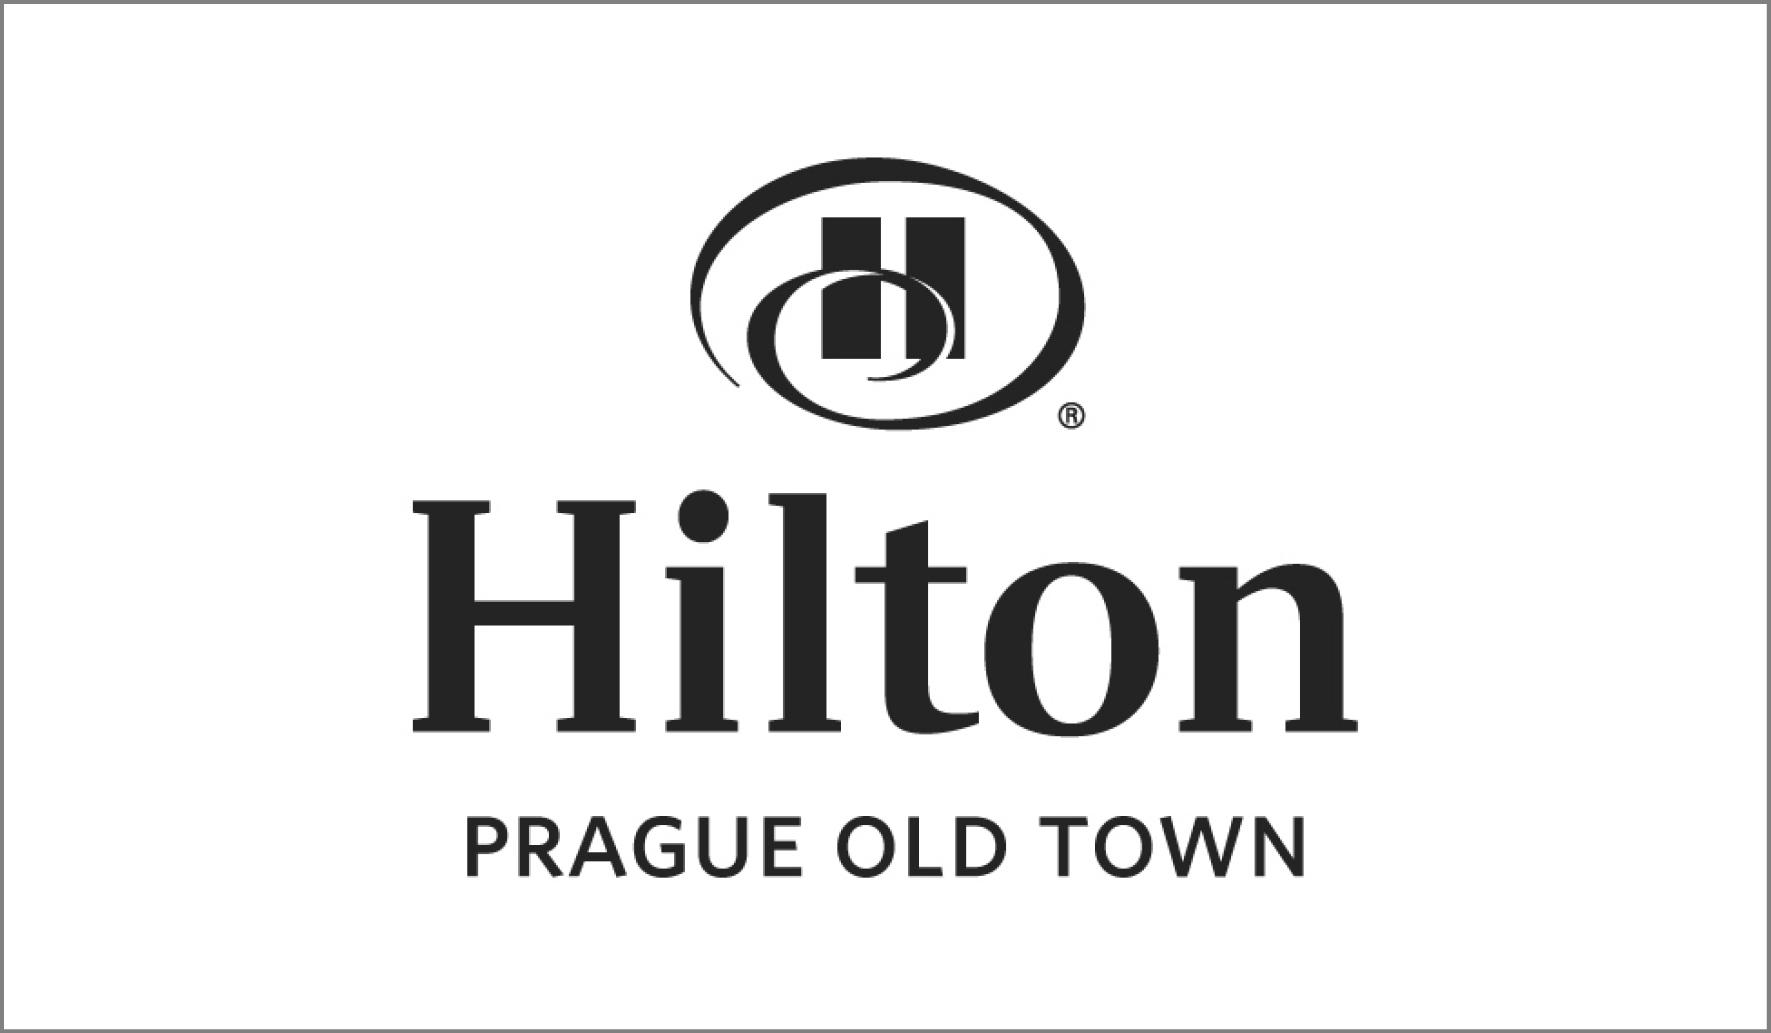 hilton-prague-old-town-f